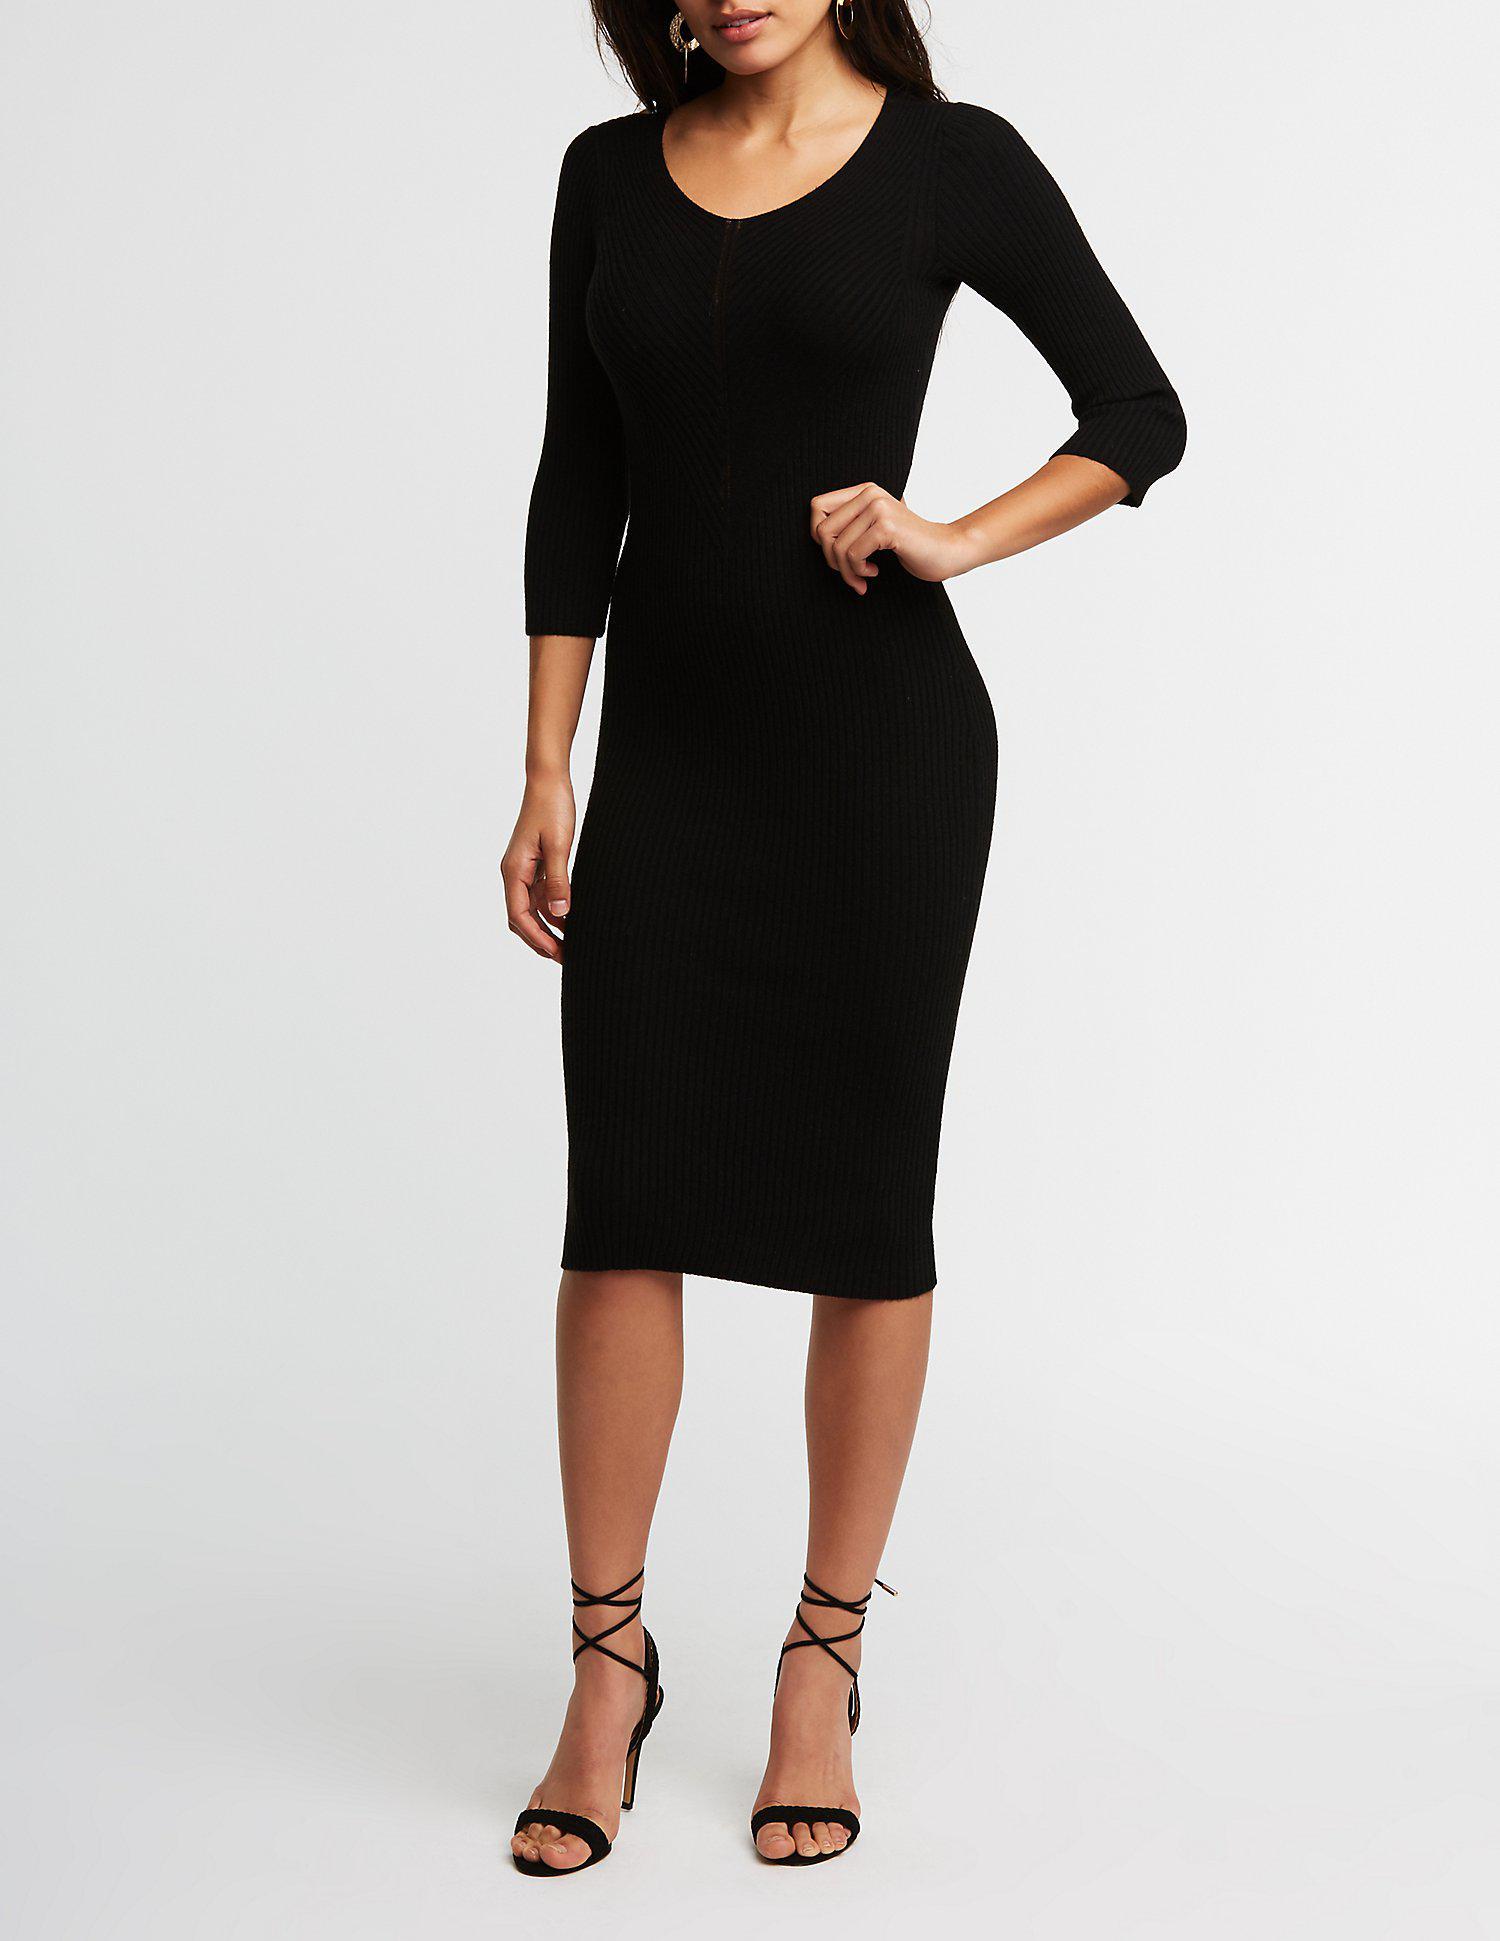 5929e12541 Lyst - Charlotte Russe Ribbed Midi Bodycon Dress in Black